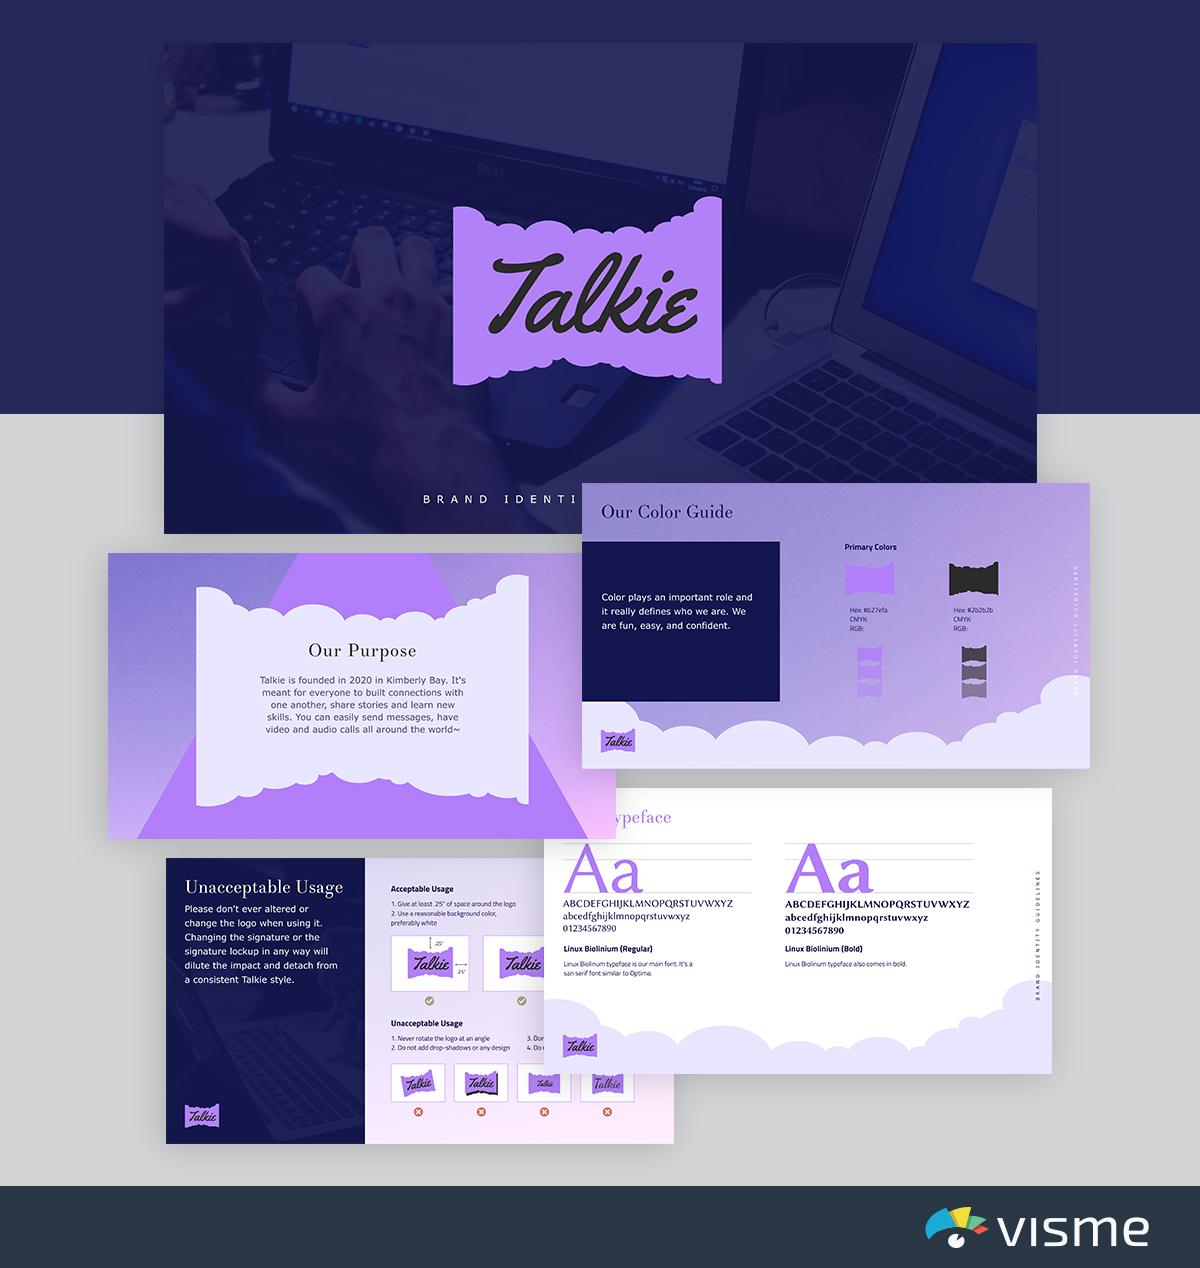 best presentation templates - talkie brand-identity-visme